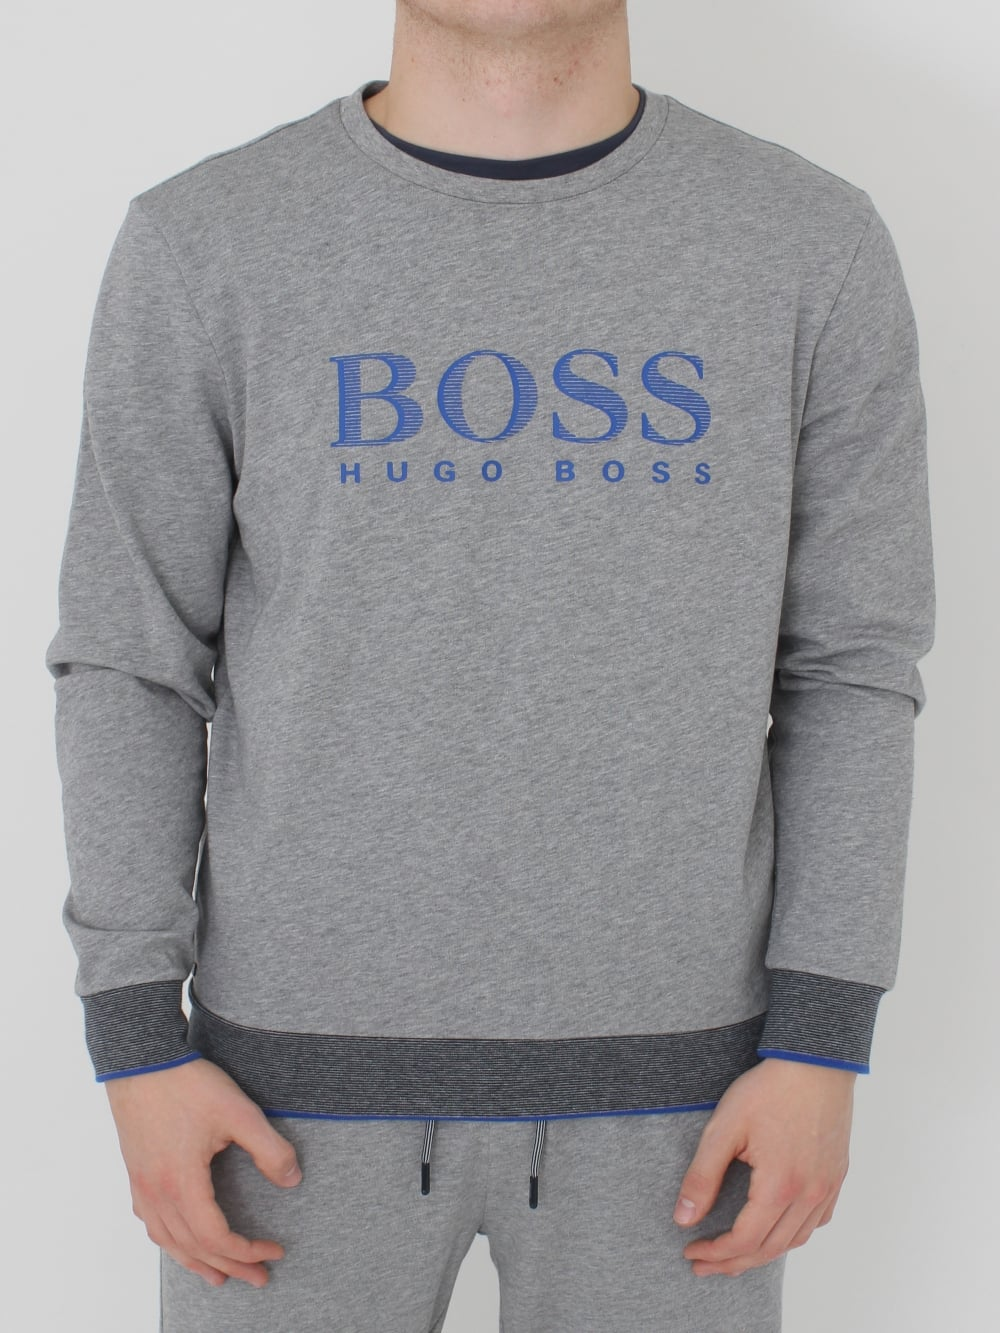 b50ceaf00 HUGO BOSS - Boss Hugo Boss Crew Neck Sweatshirt in Mid Grey ...